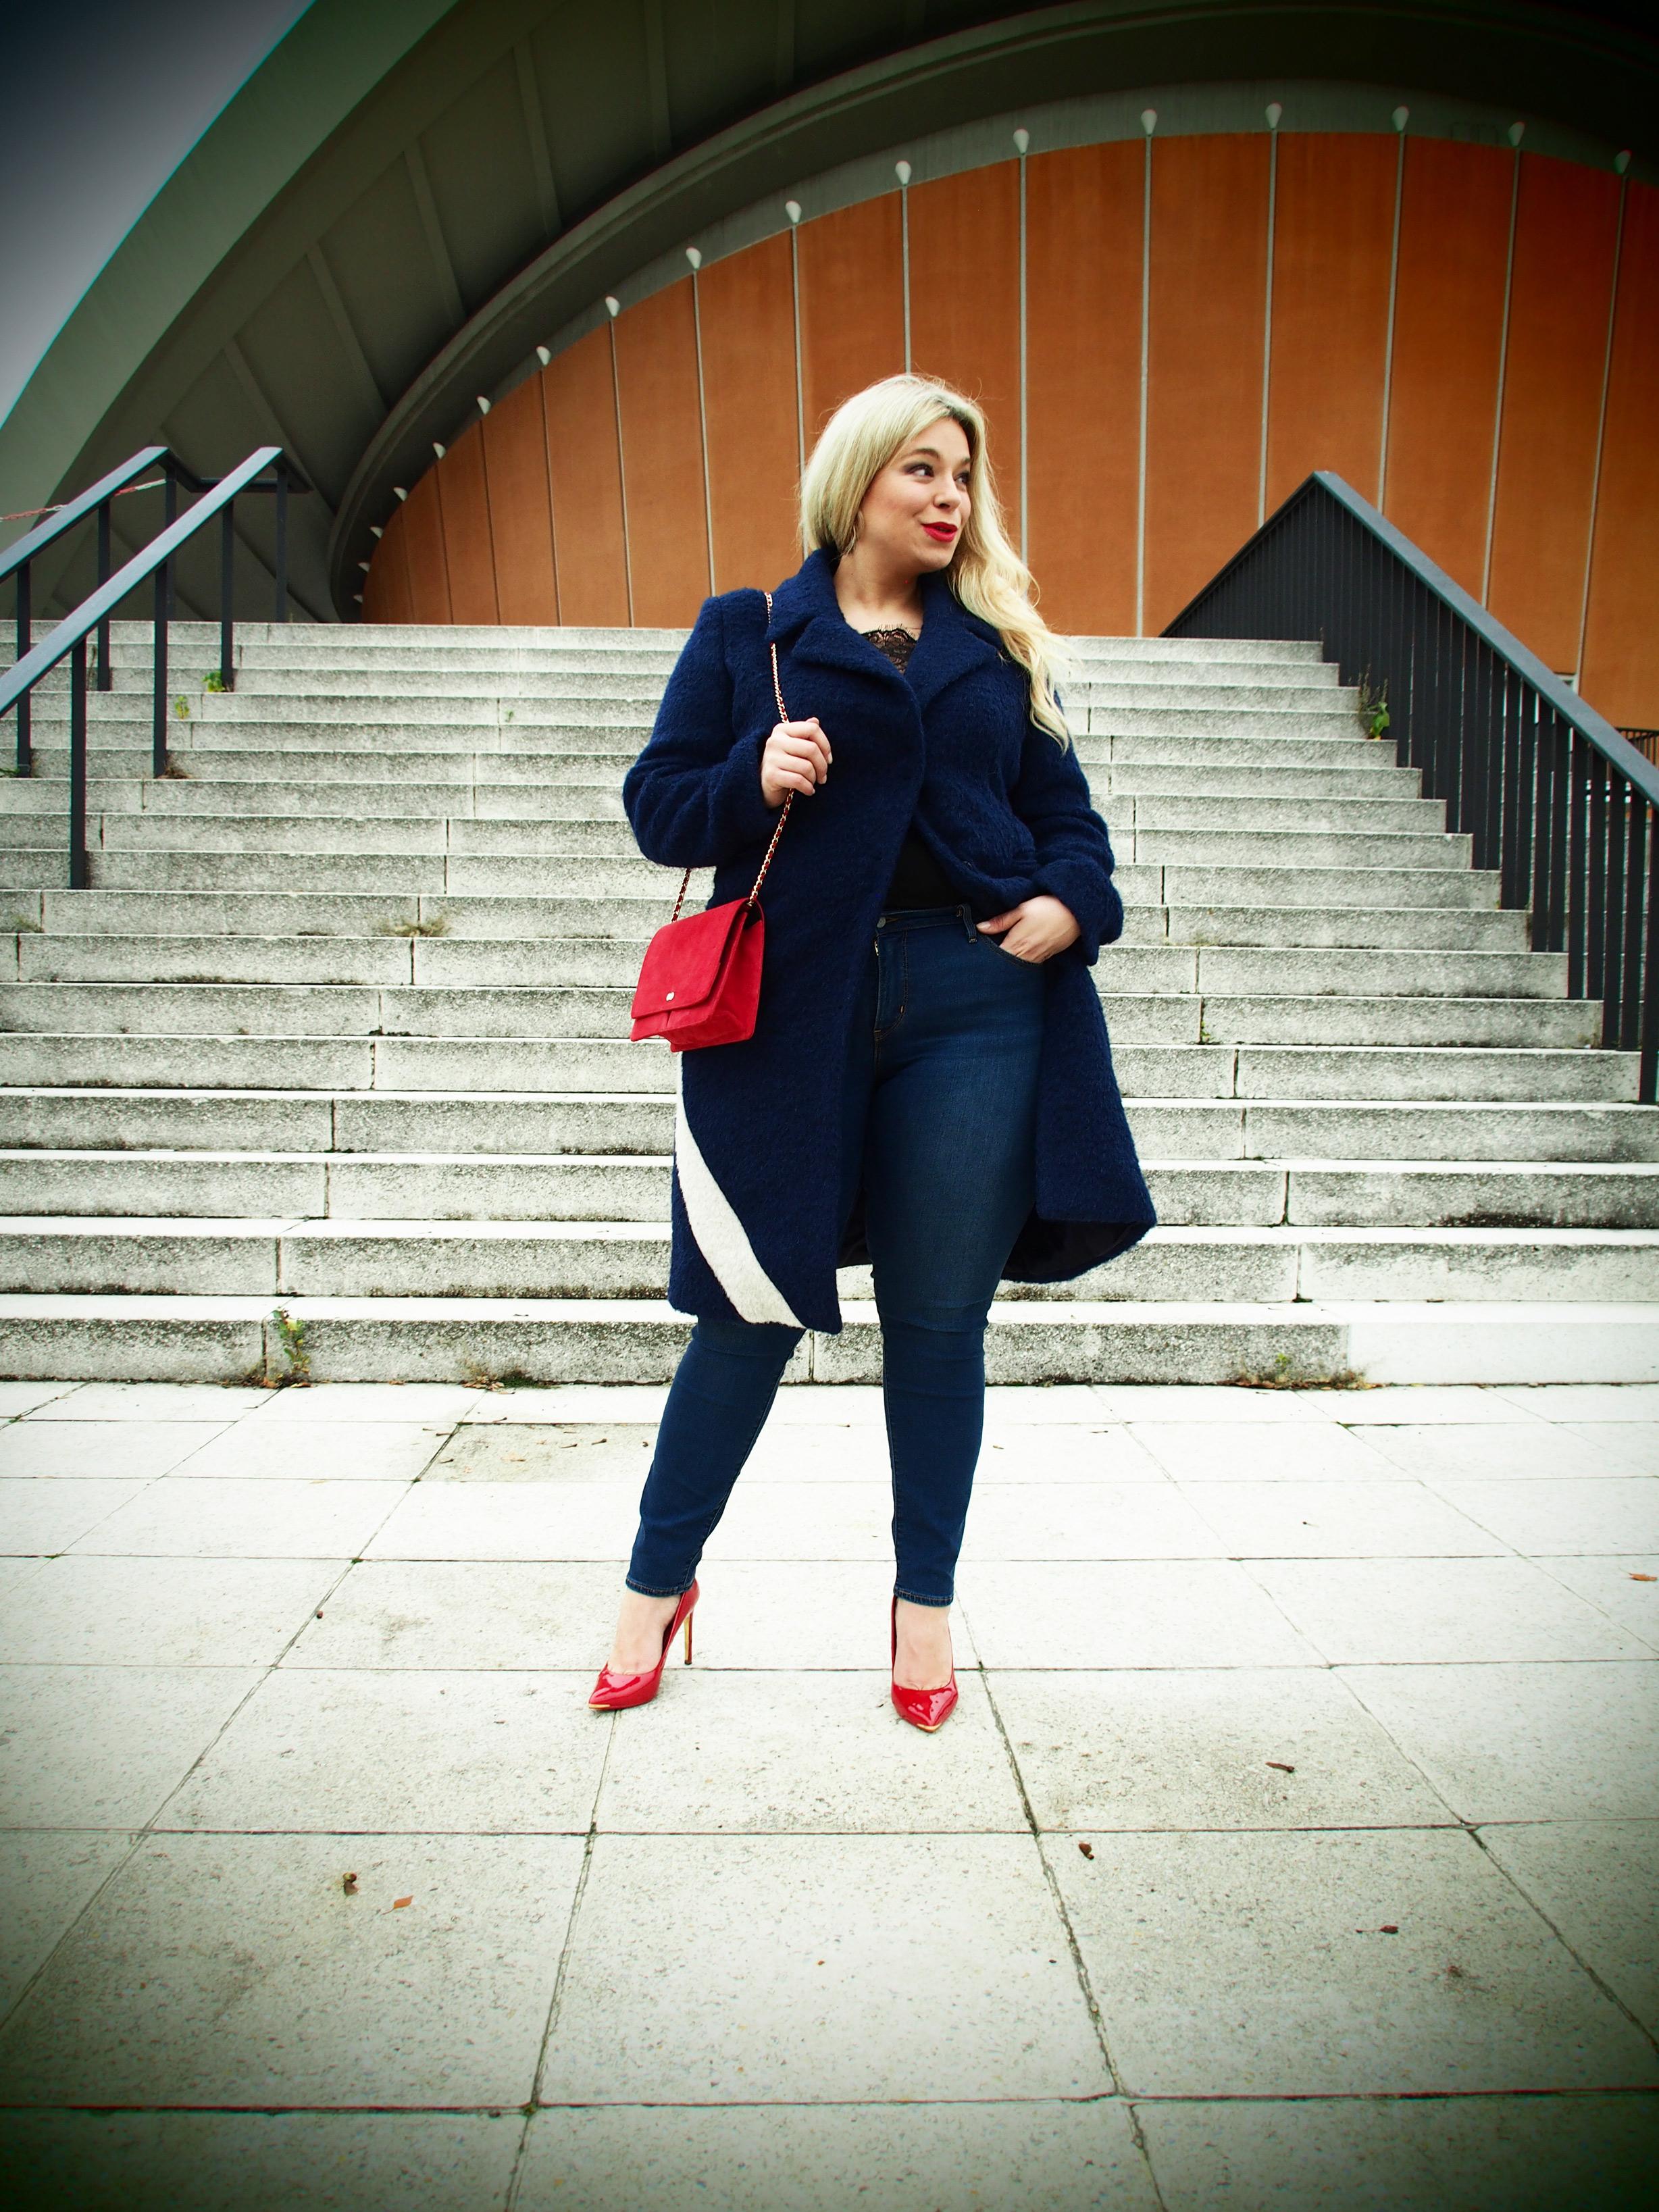 Megabambi-Pliussizeblogger-persona-by-MarinaRinaldi-caterina-pogorzelski-curvyoutfit